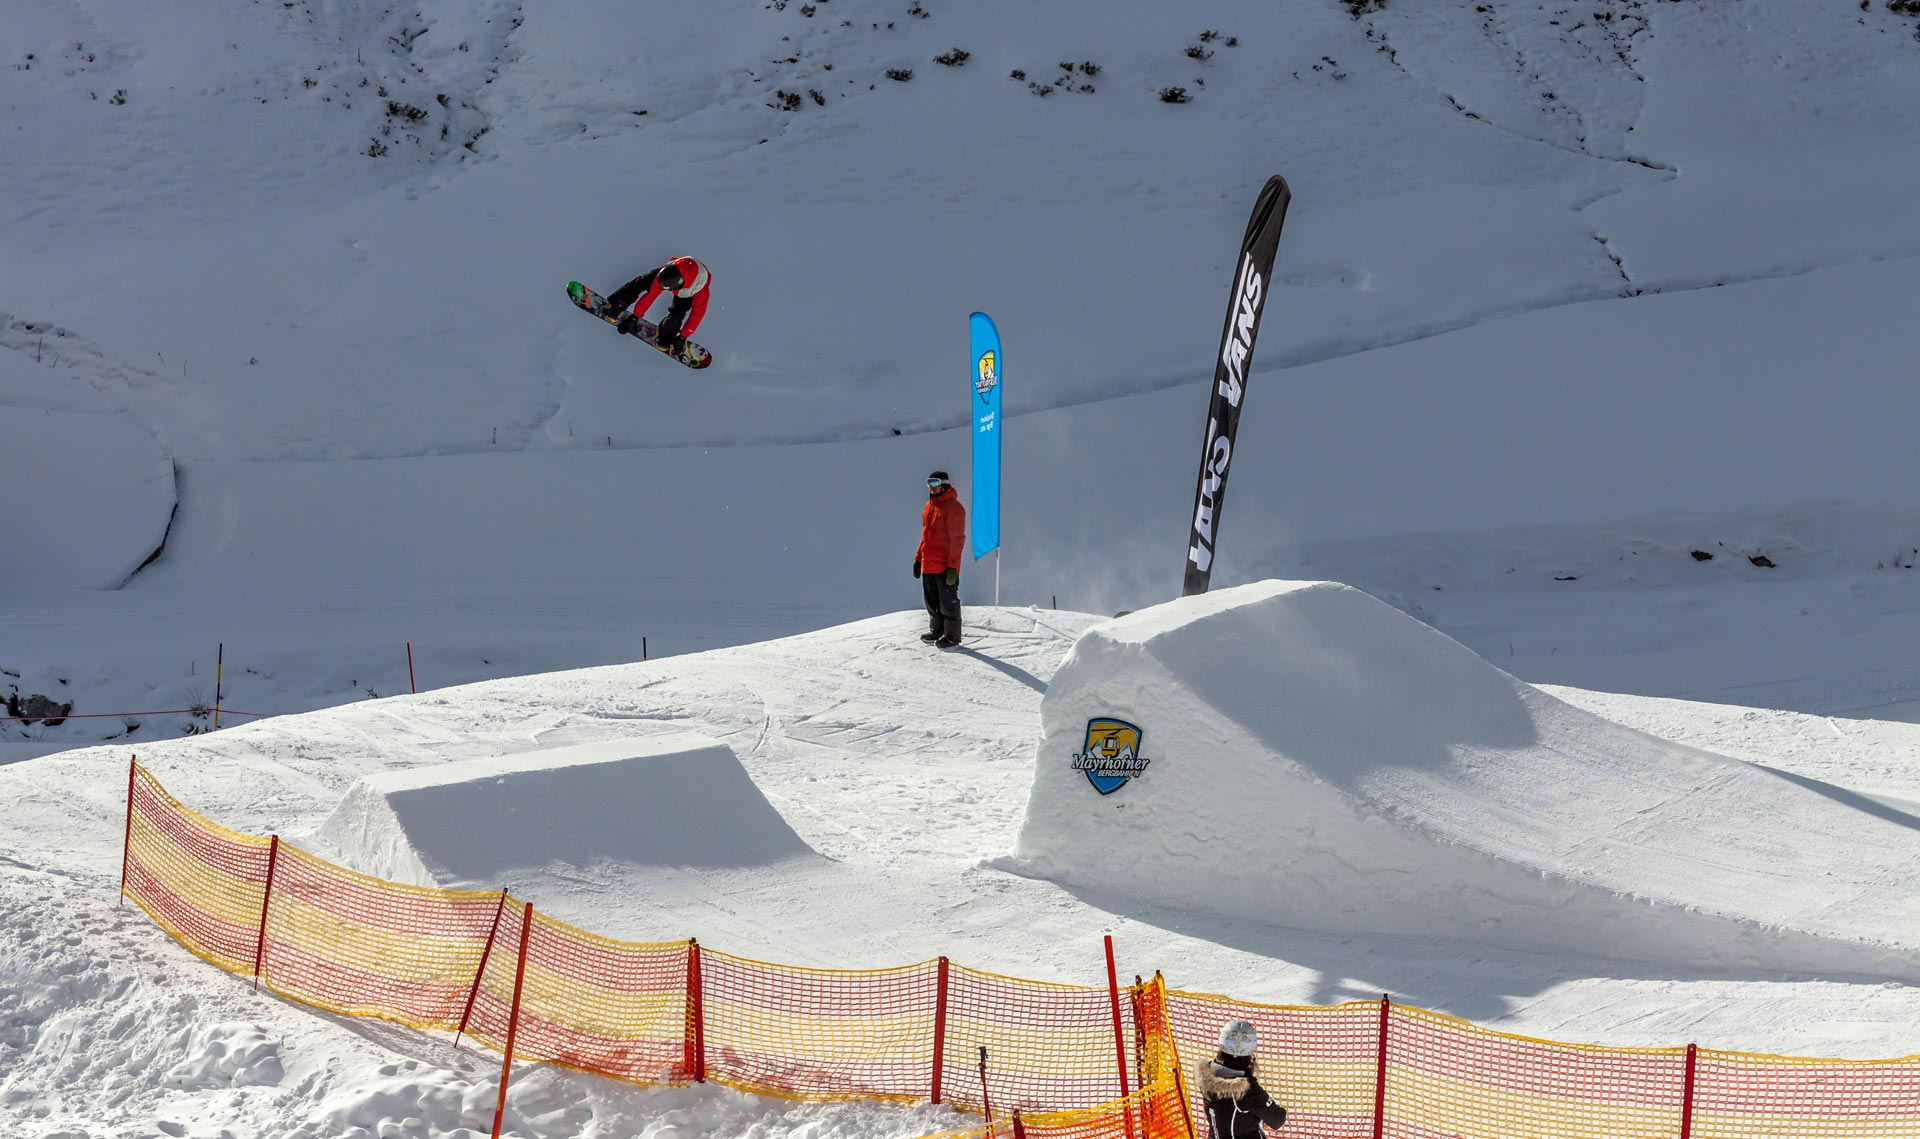 Preview: Vans Groms Open - Vans Penken Park Mayrhofen - Foto: Jasper Doppenberger